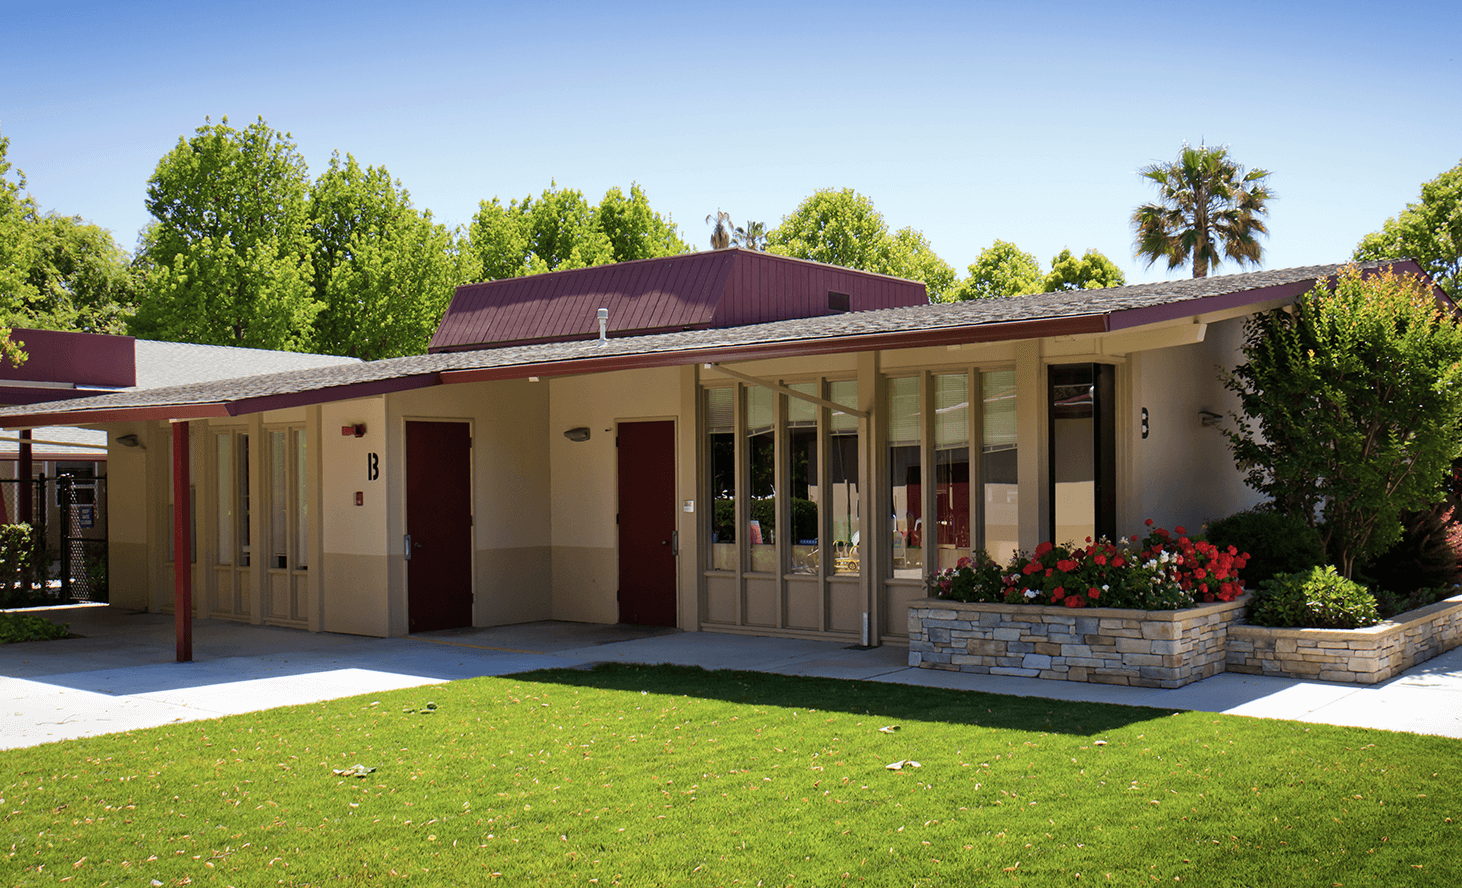 Campus Exterior | Challenger School - Middlefield | Private School In Palo Alto, California